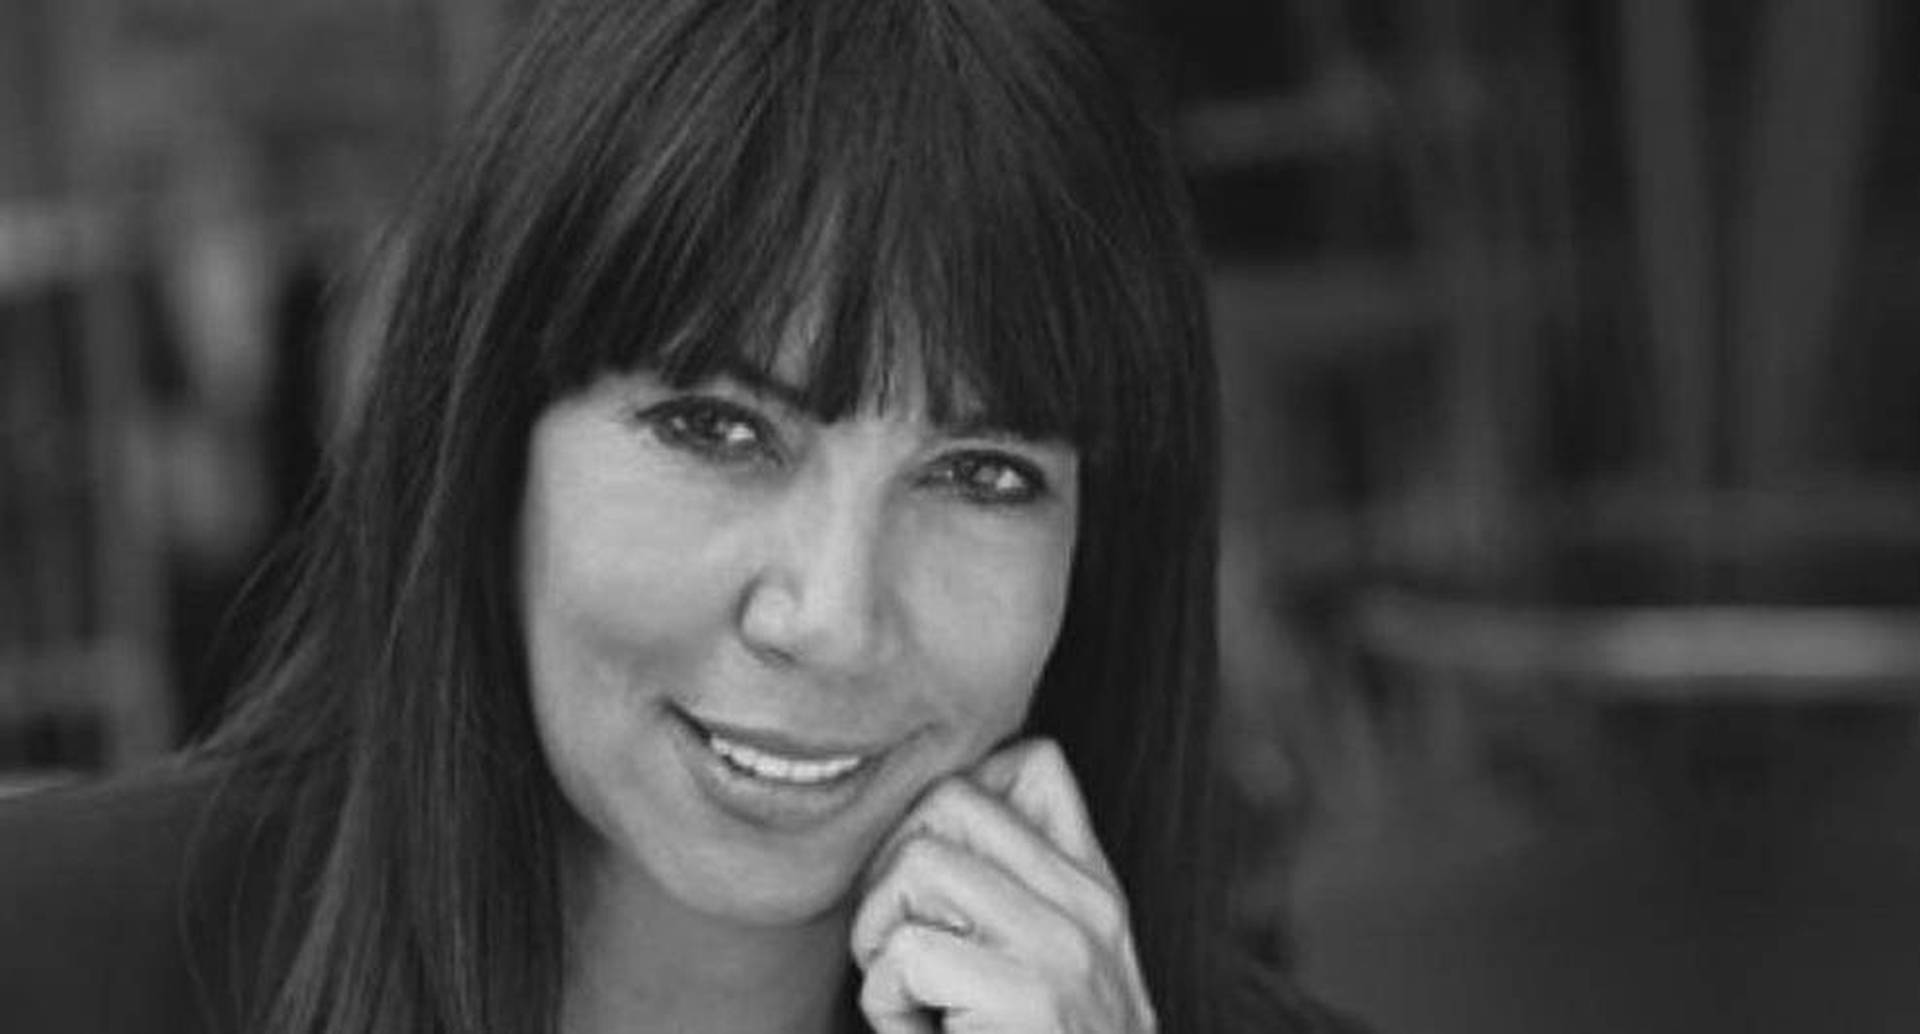 A remover conciencias, por María Jimena Duzán.